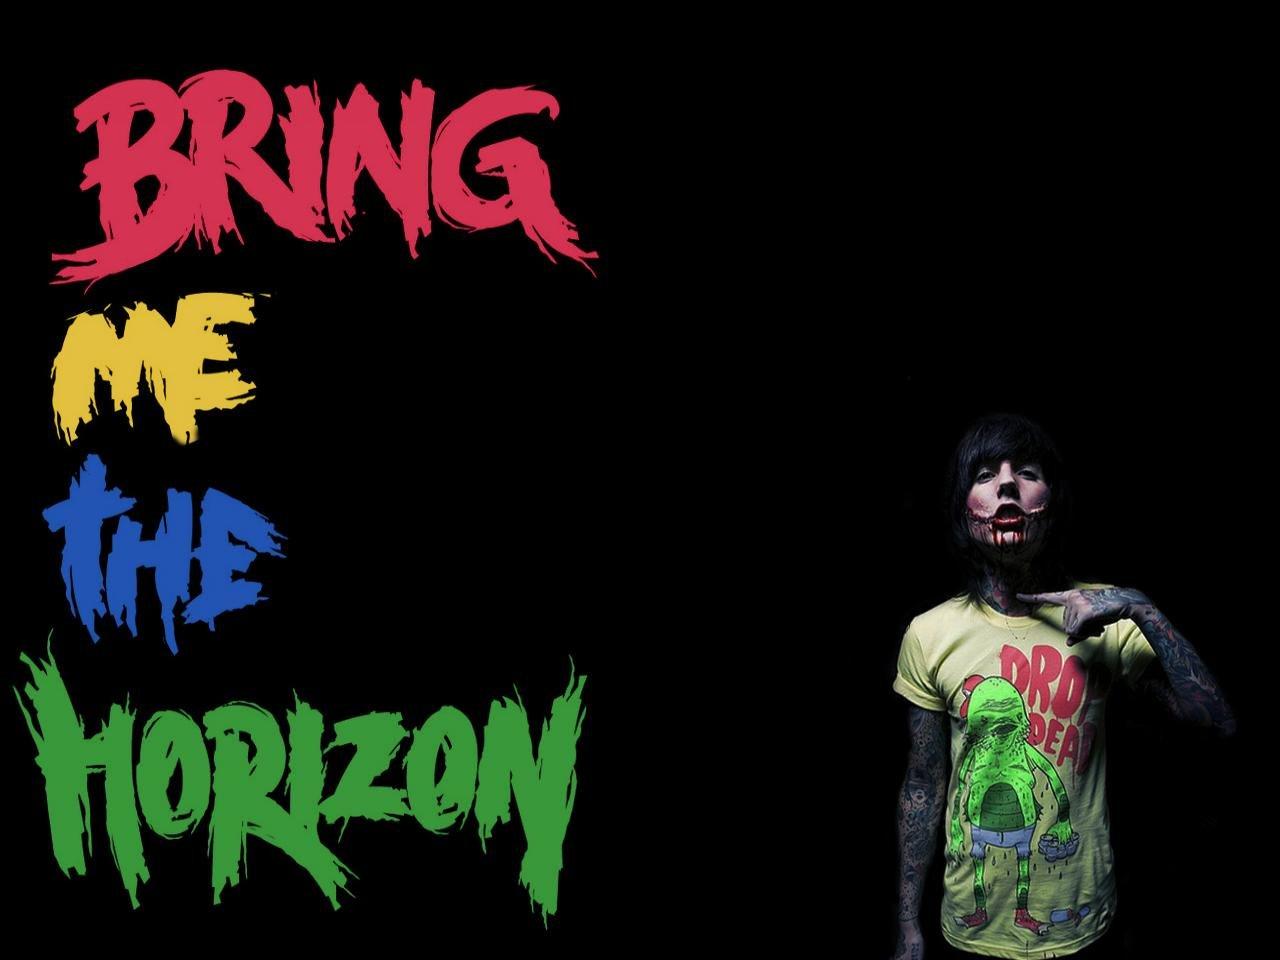 Free Download Bring Me The Horizon Wallpaper Id 190896 Hd 1280x960